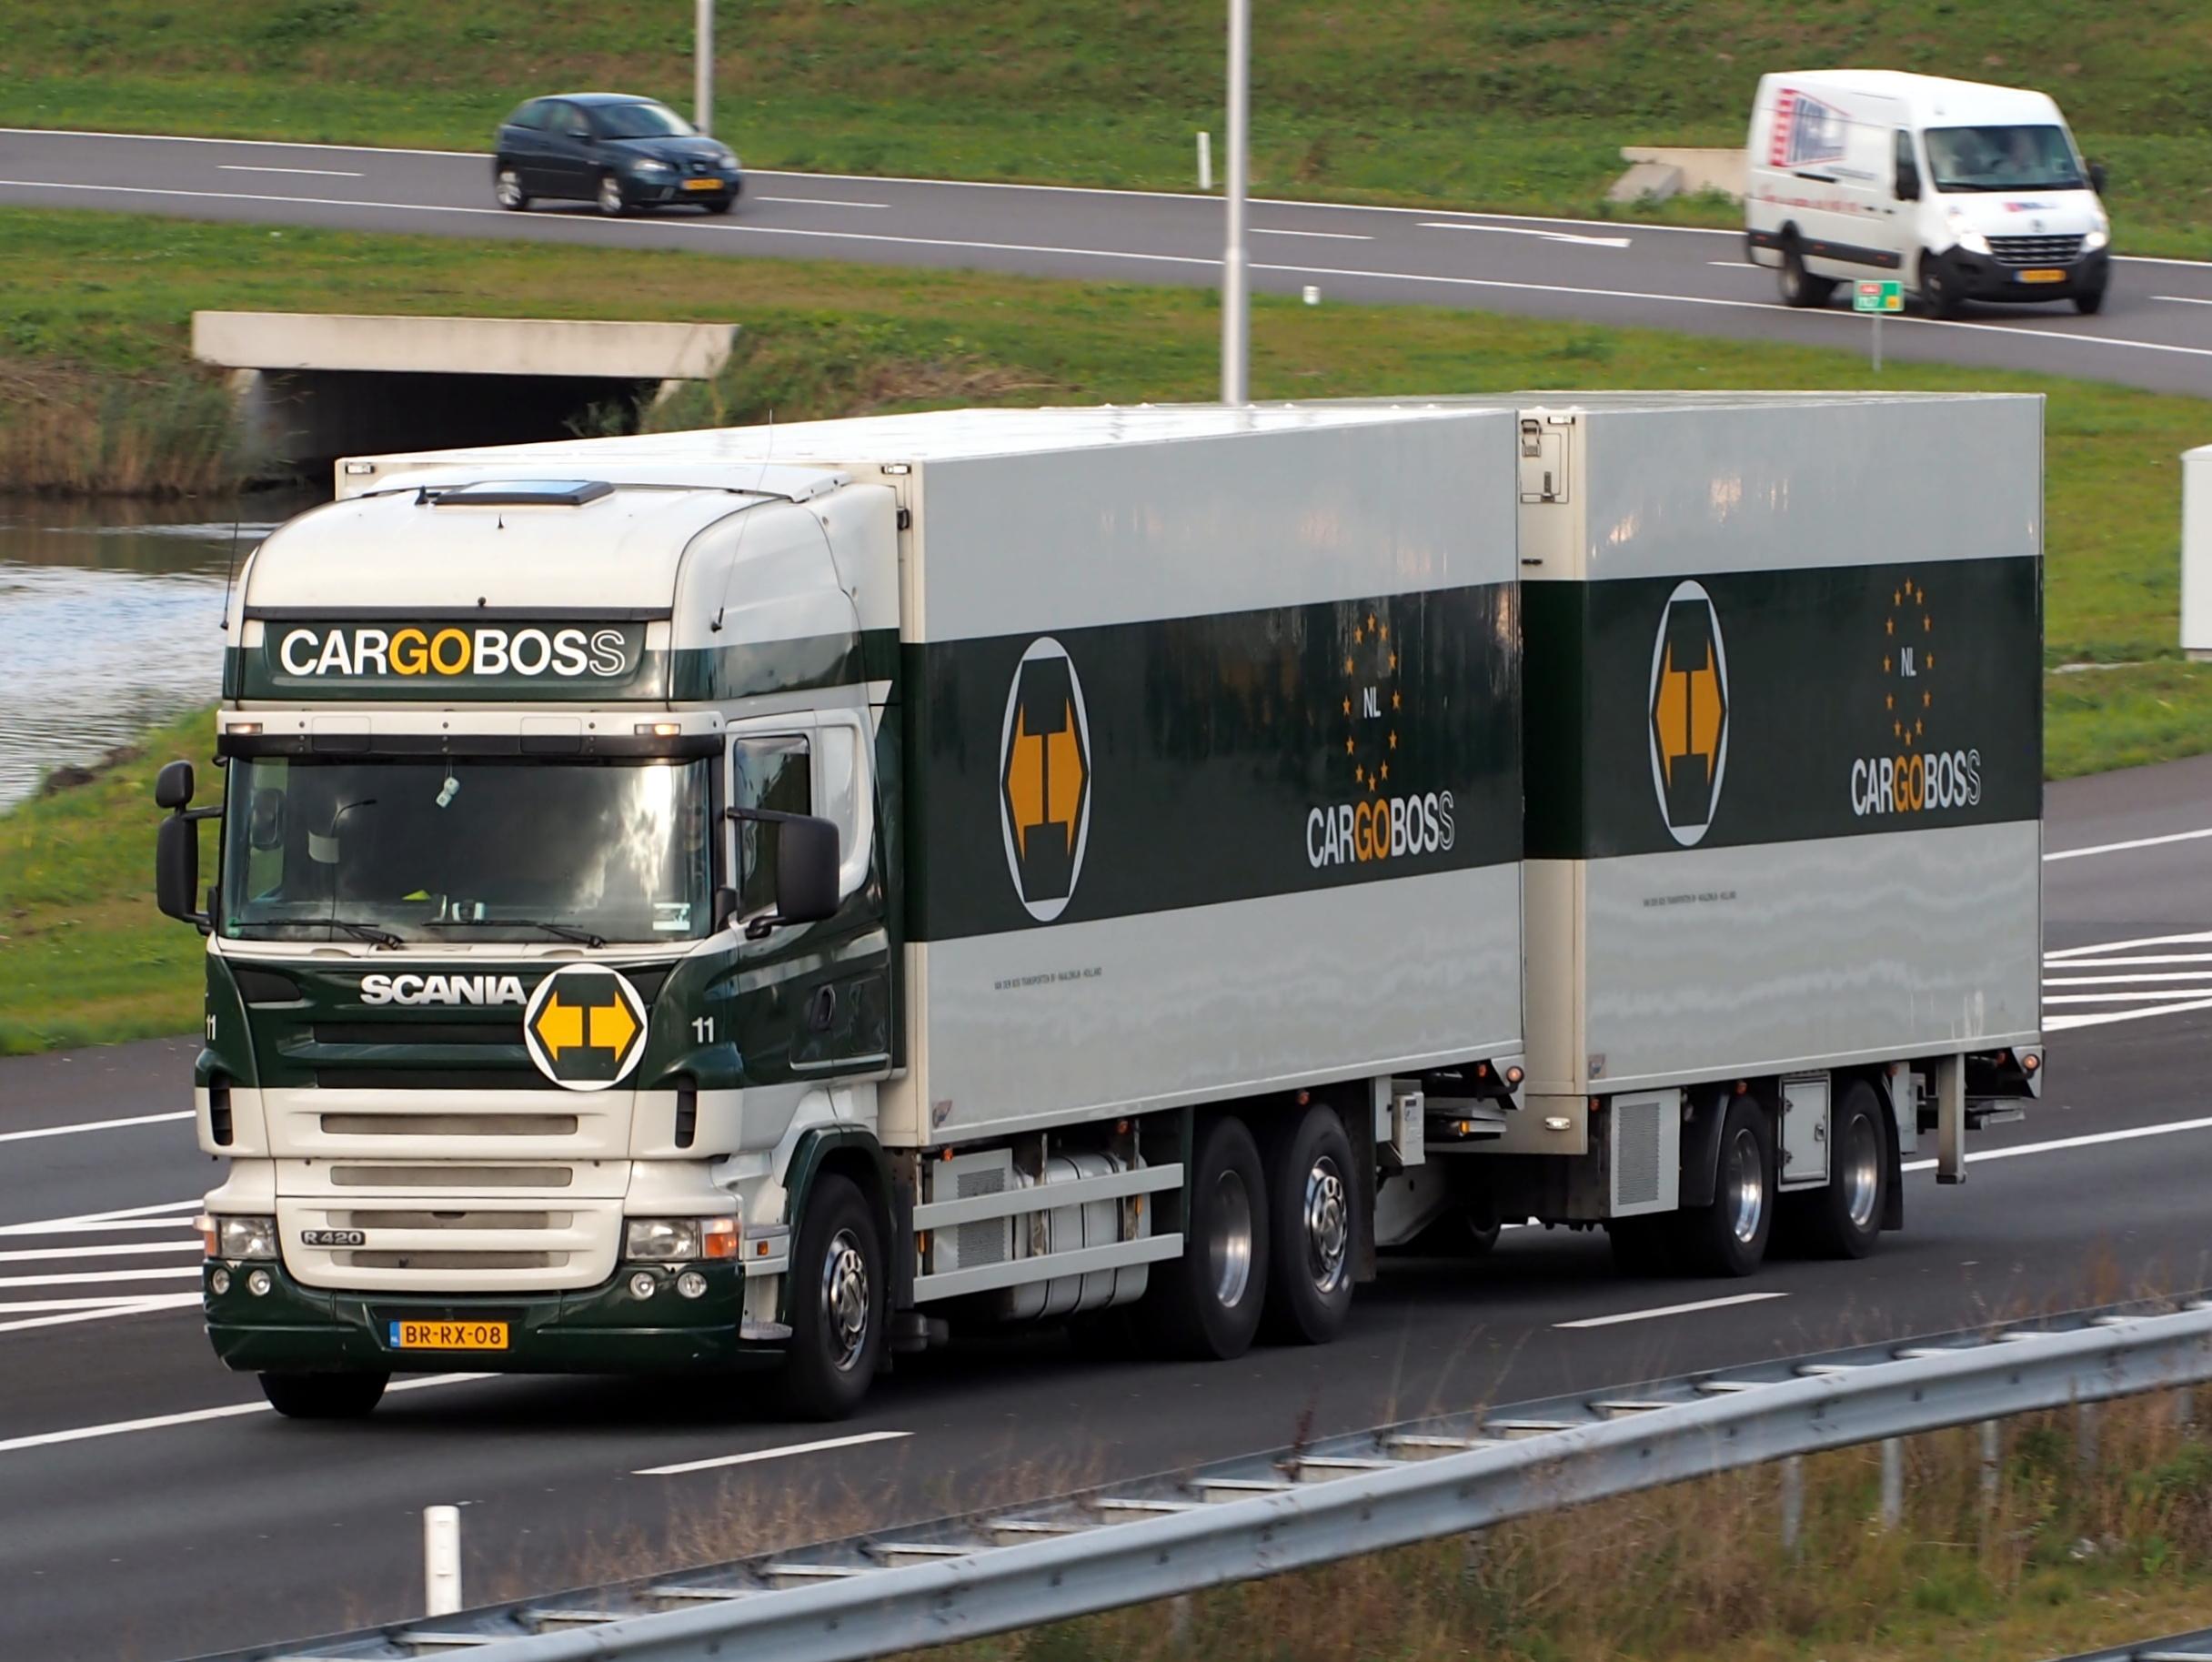 File:SCANIA R420, CargoBoss.JPG - Wikimedia Commons